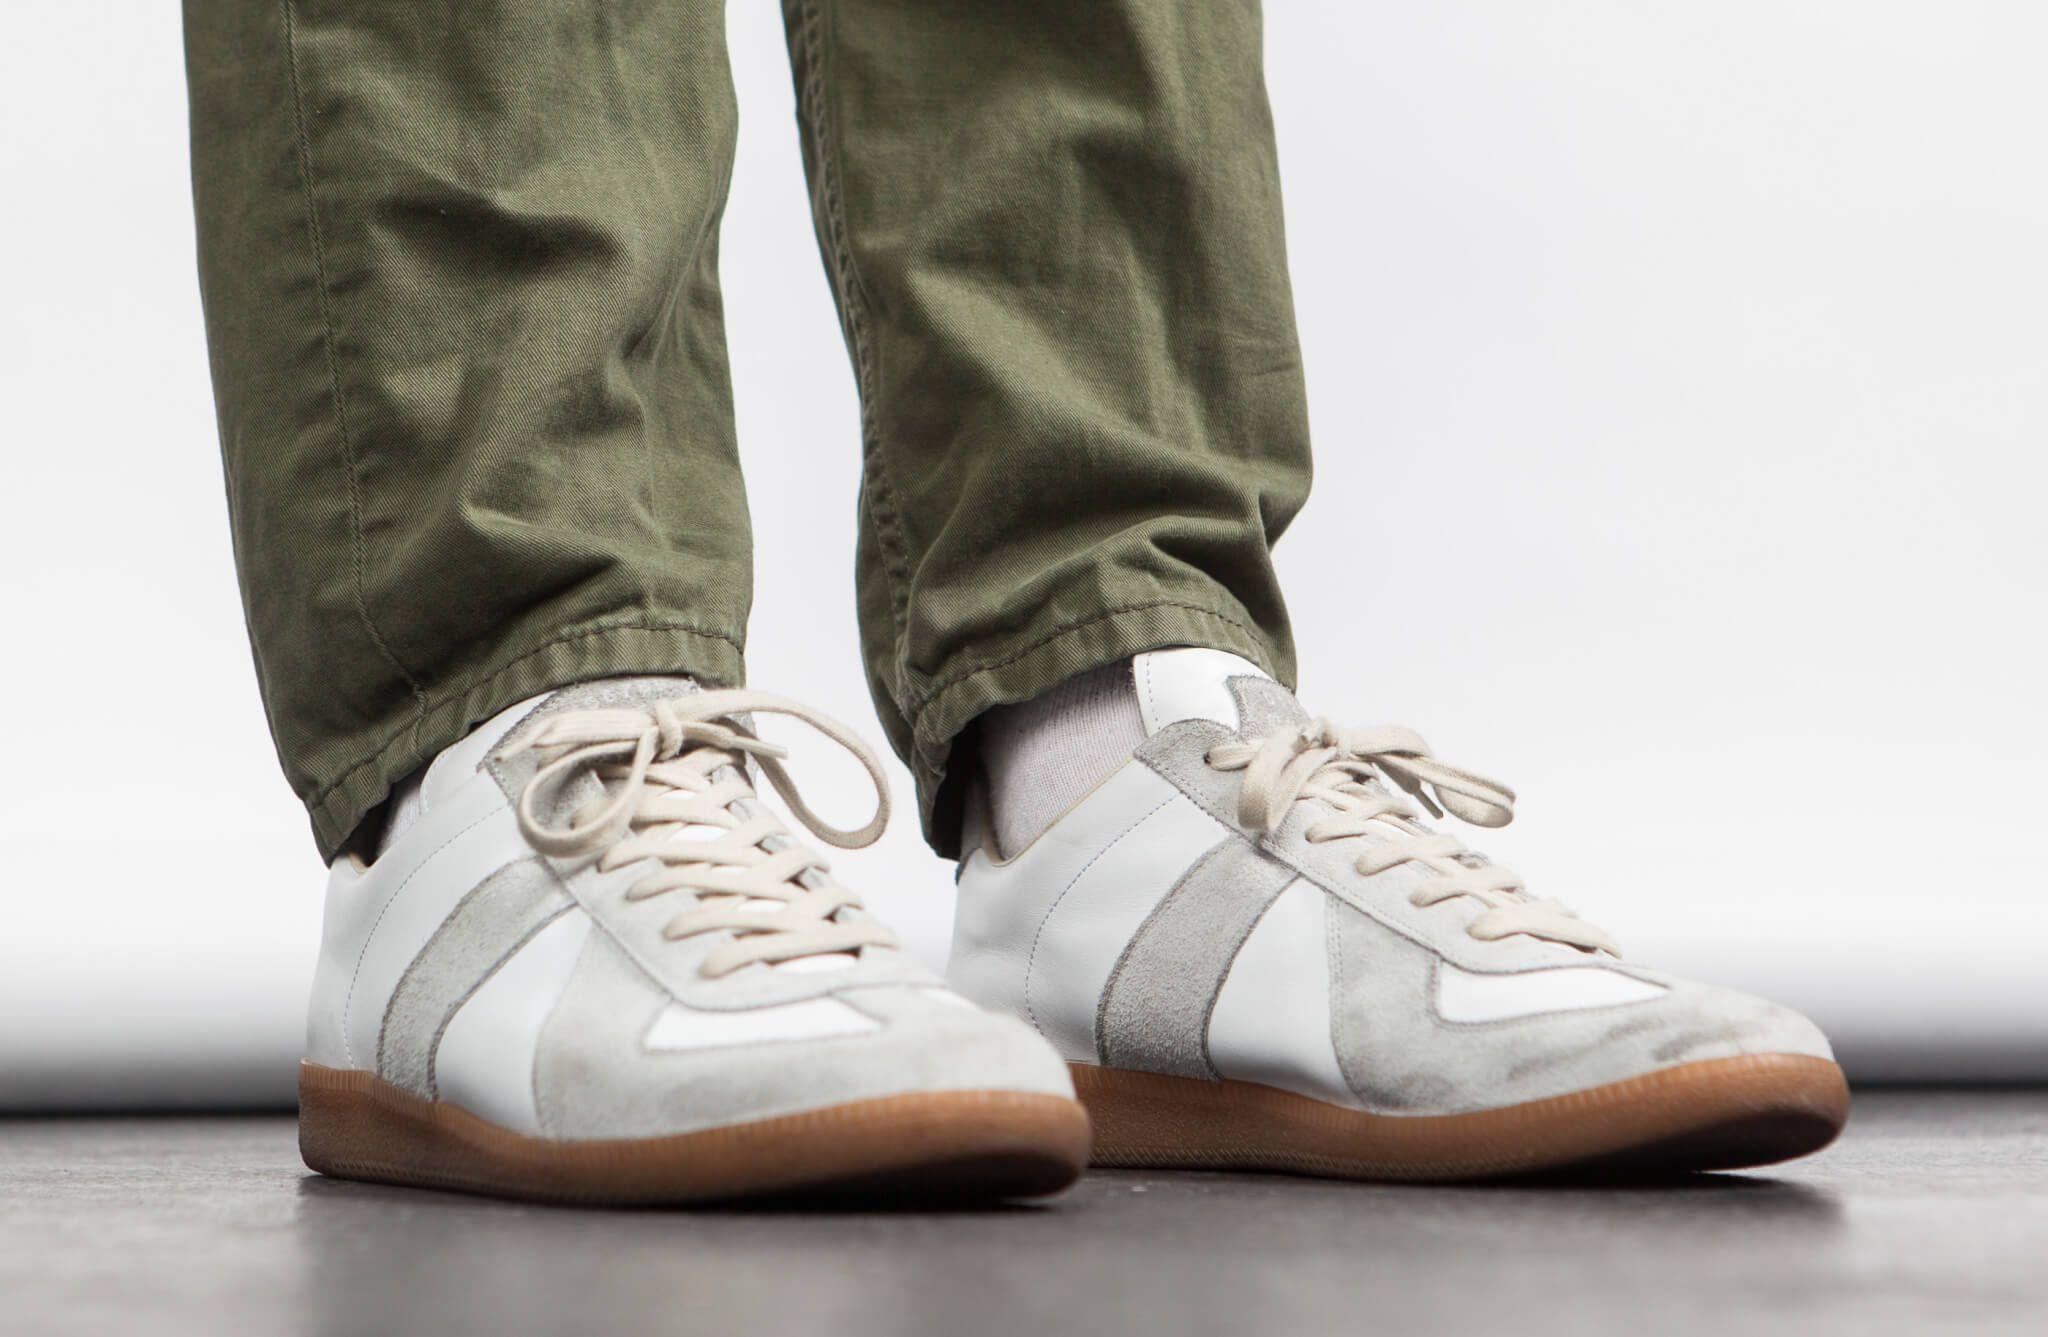 Adidas BW Army Shoe Initial Impression : malefashionadvice GAT